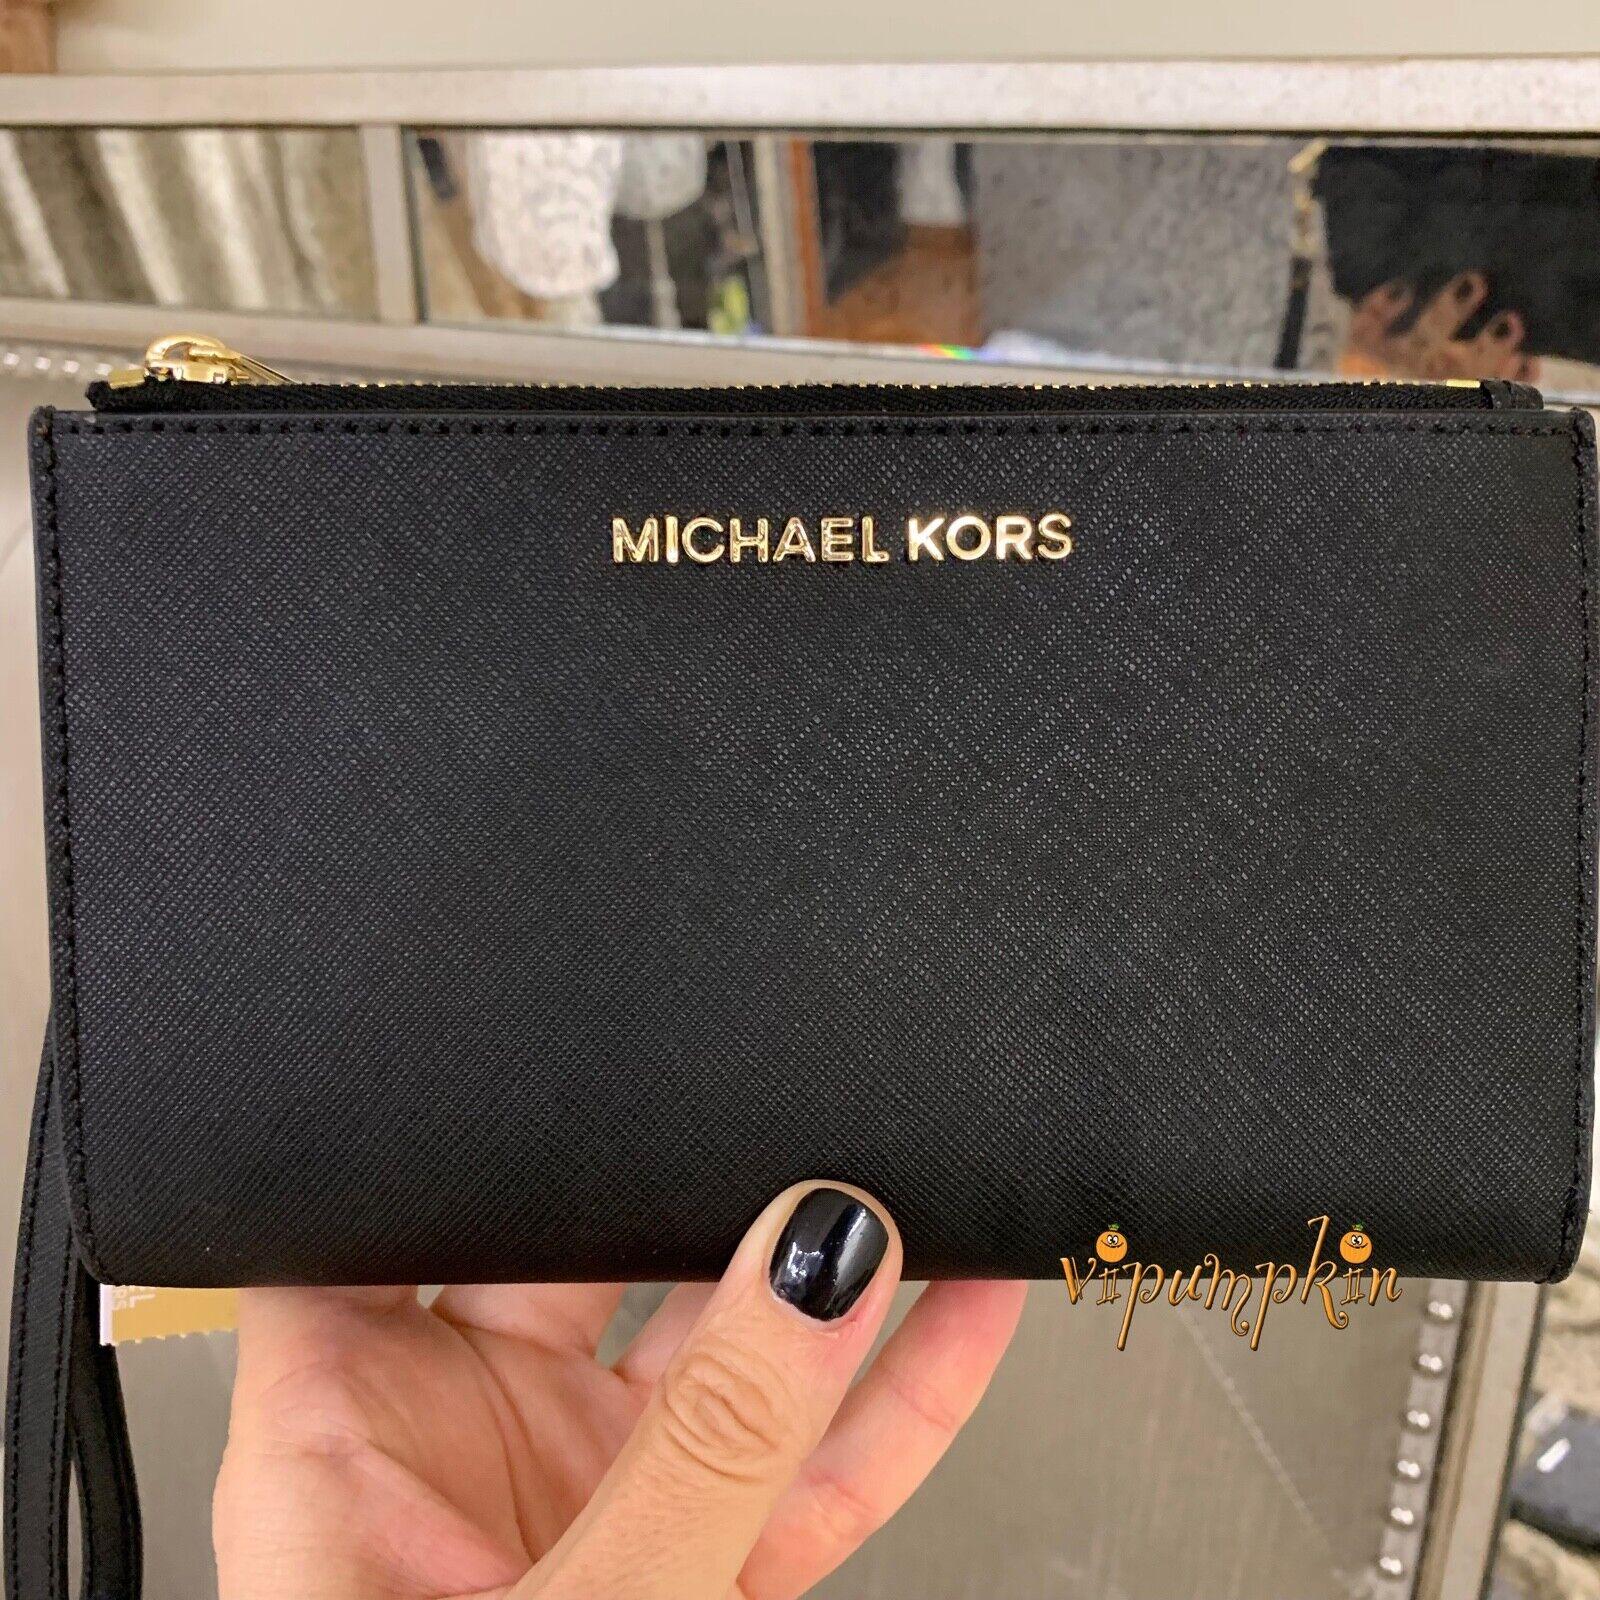 Michael Kors Jet Set Travel Double Zip Leather Wallet Phone Wristlet Black